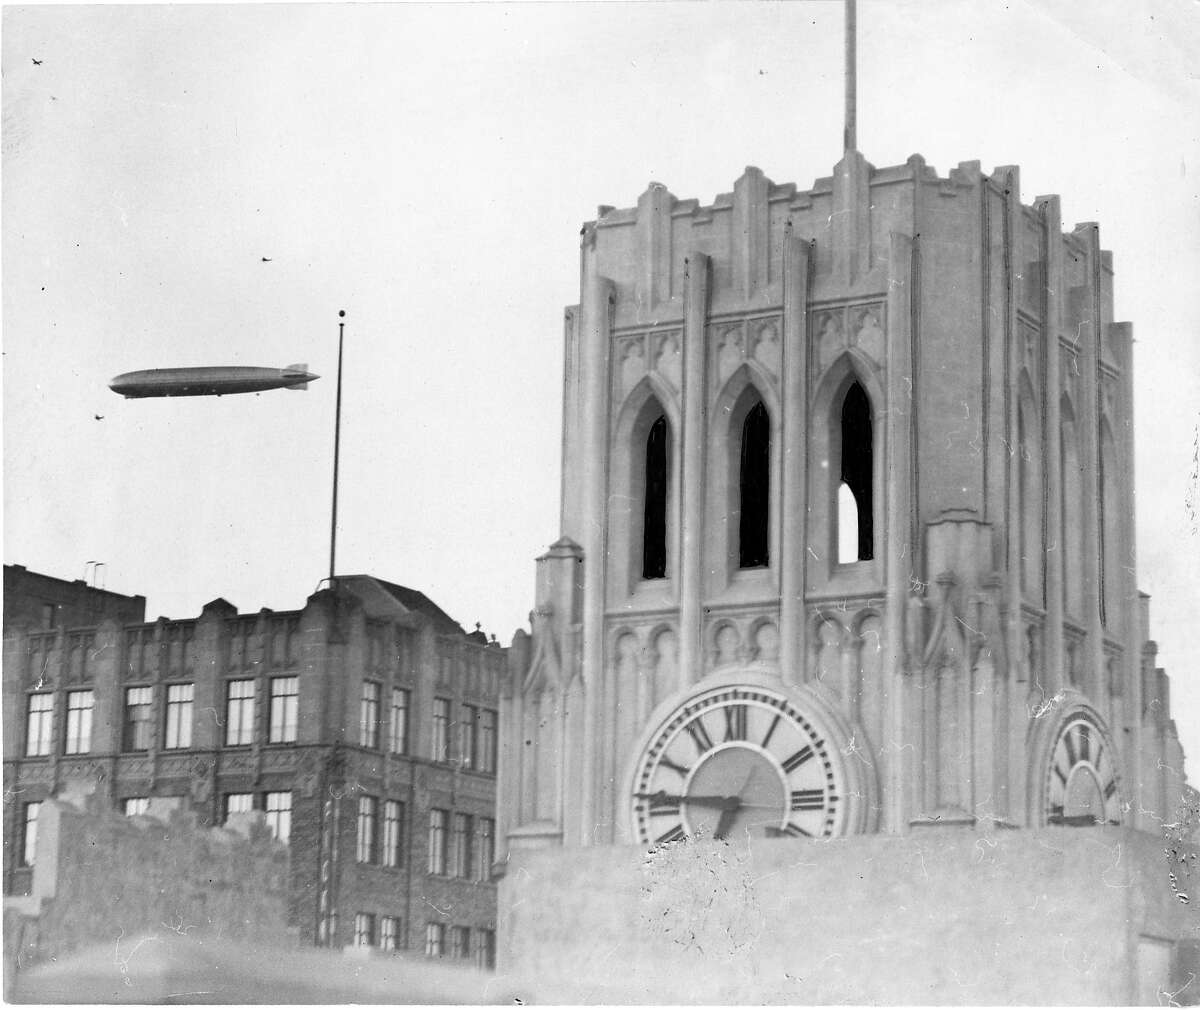 The Graf Zeppelin flies near the Chronicle building, August 25 1929 Photo ran 08/26/1929